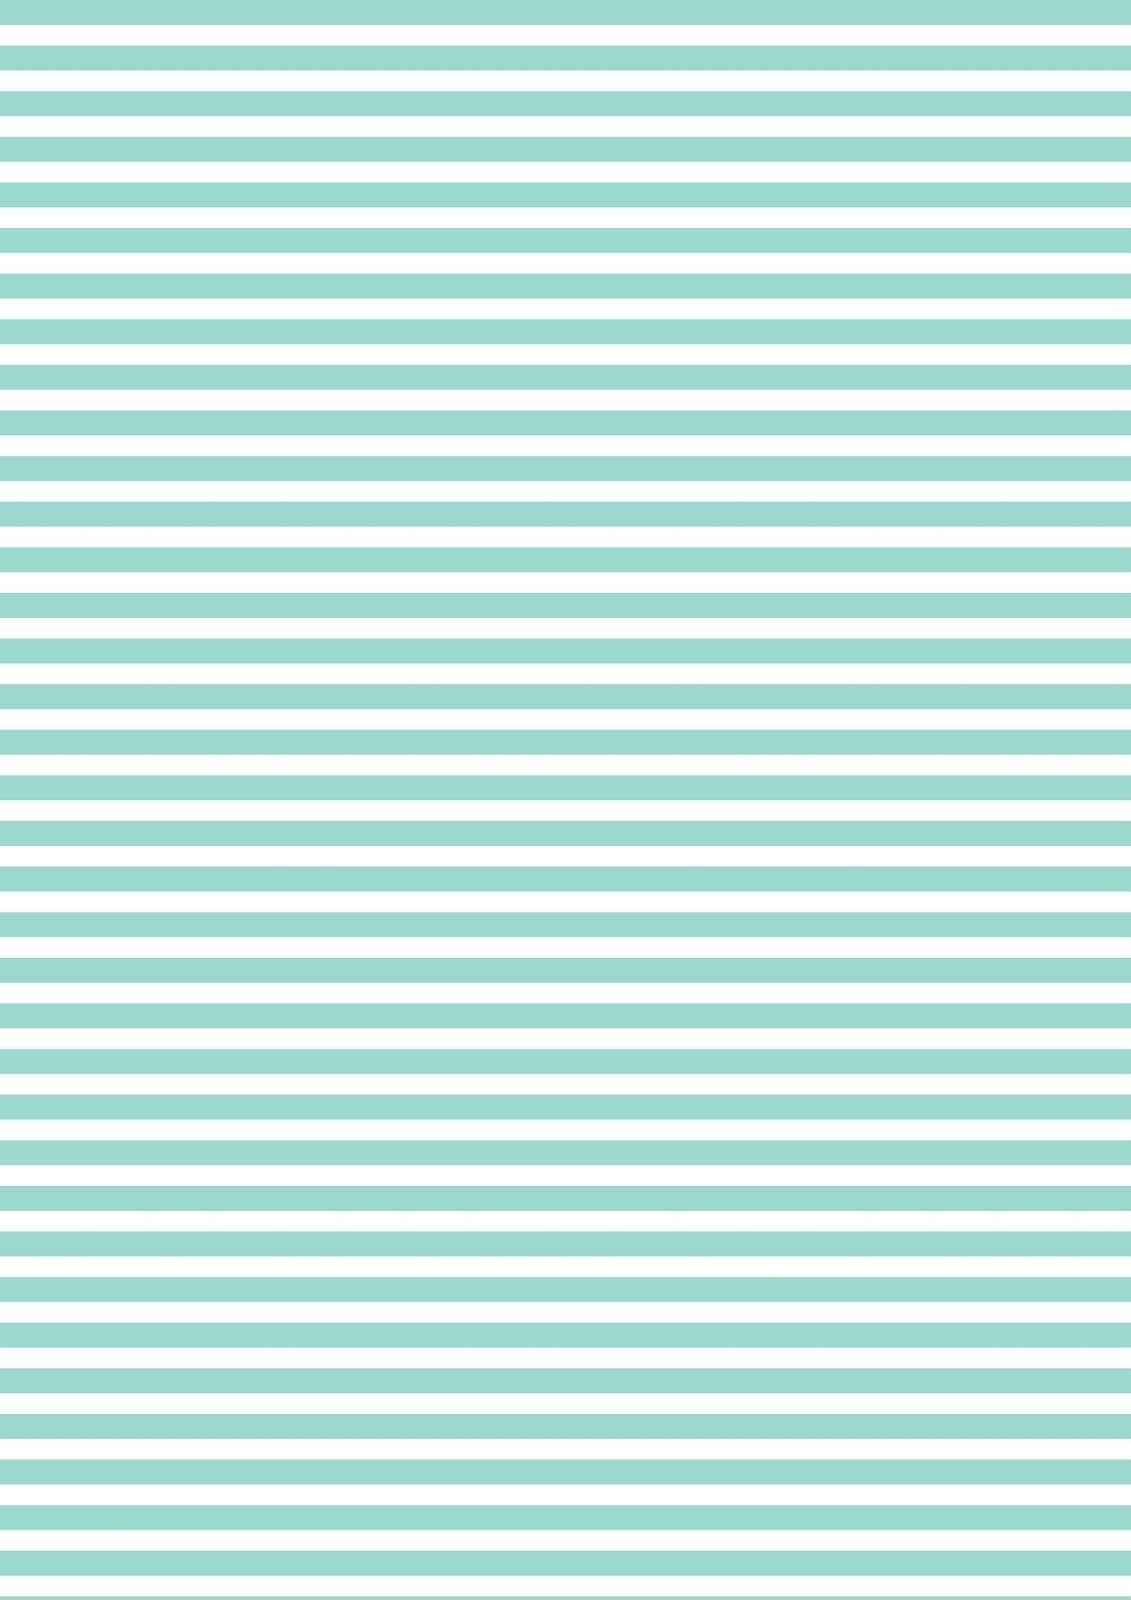 Scrapbook Backgrounds Printables Free Printable Turquoise White - Free Printable Backgrounds